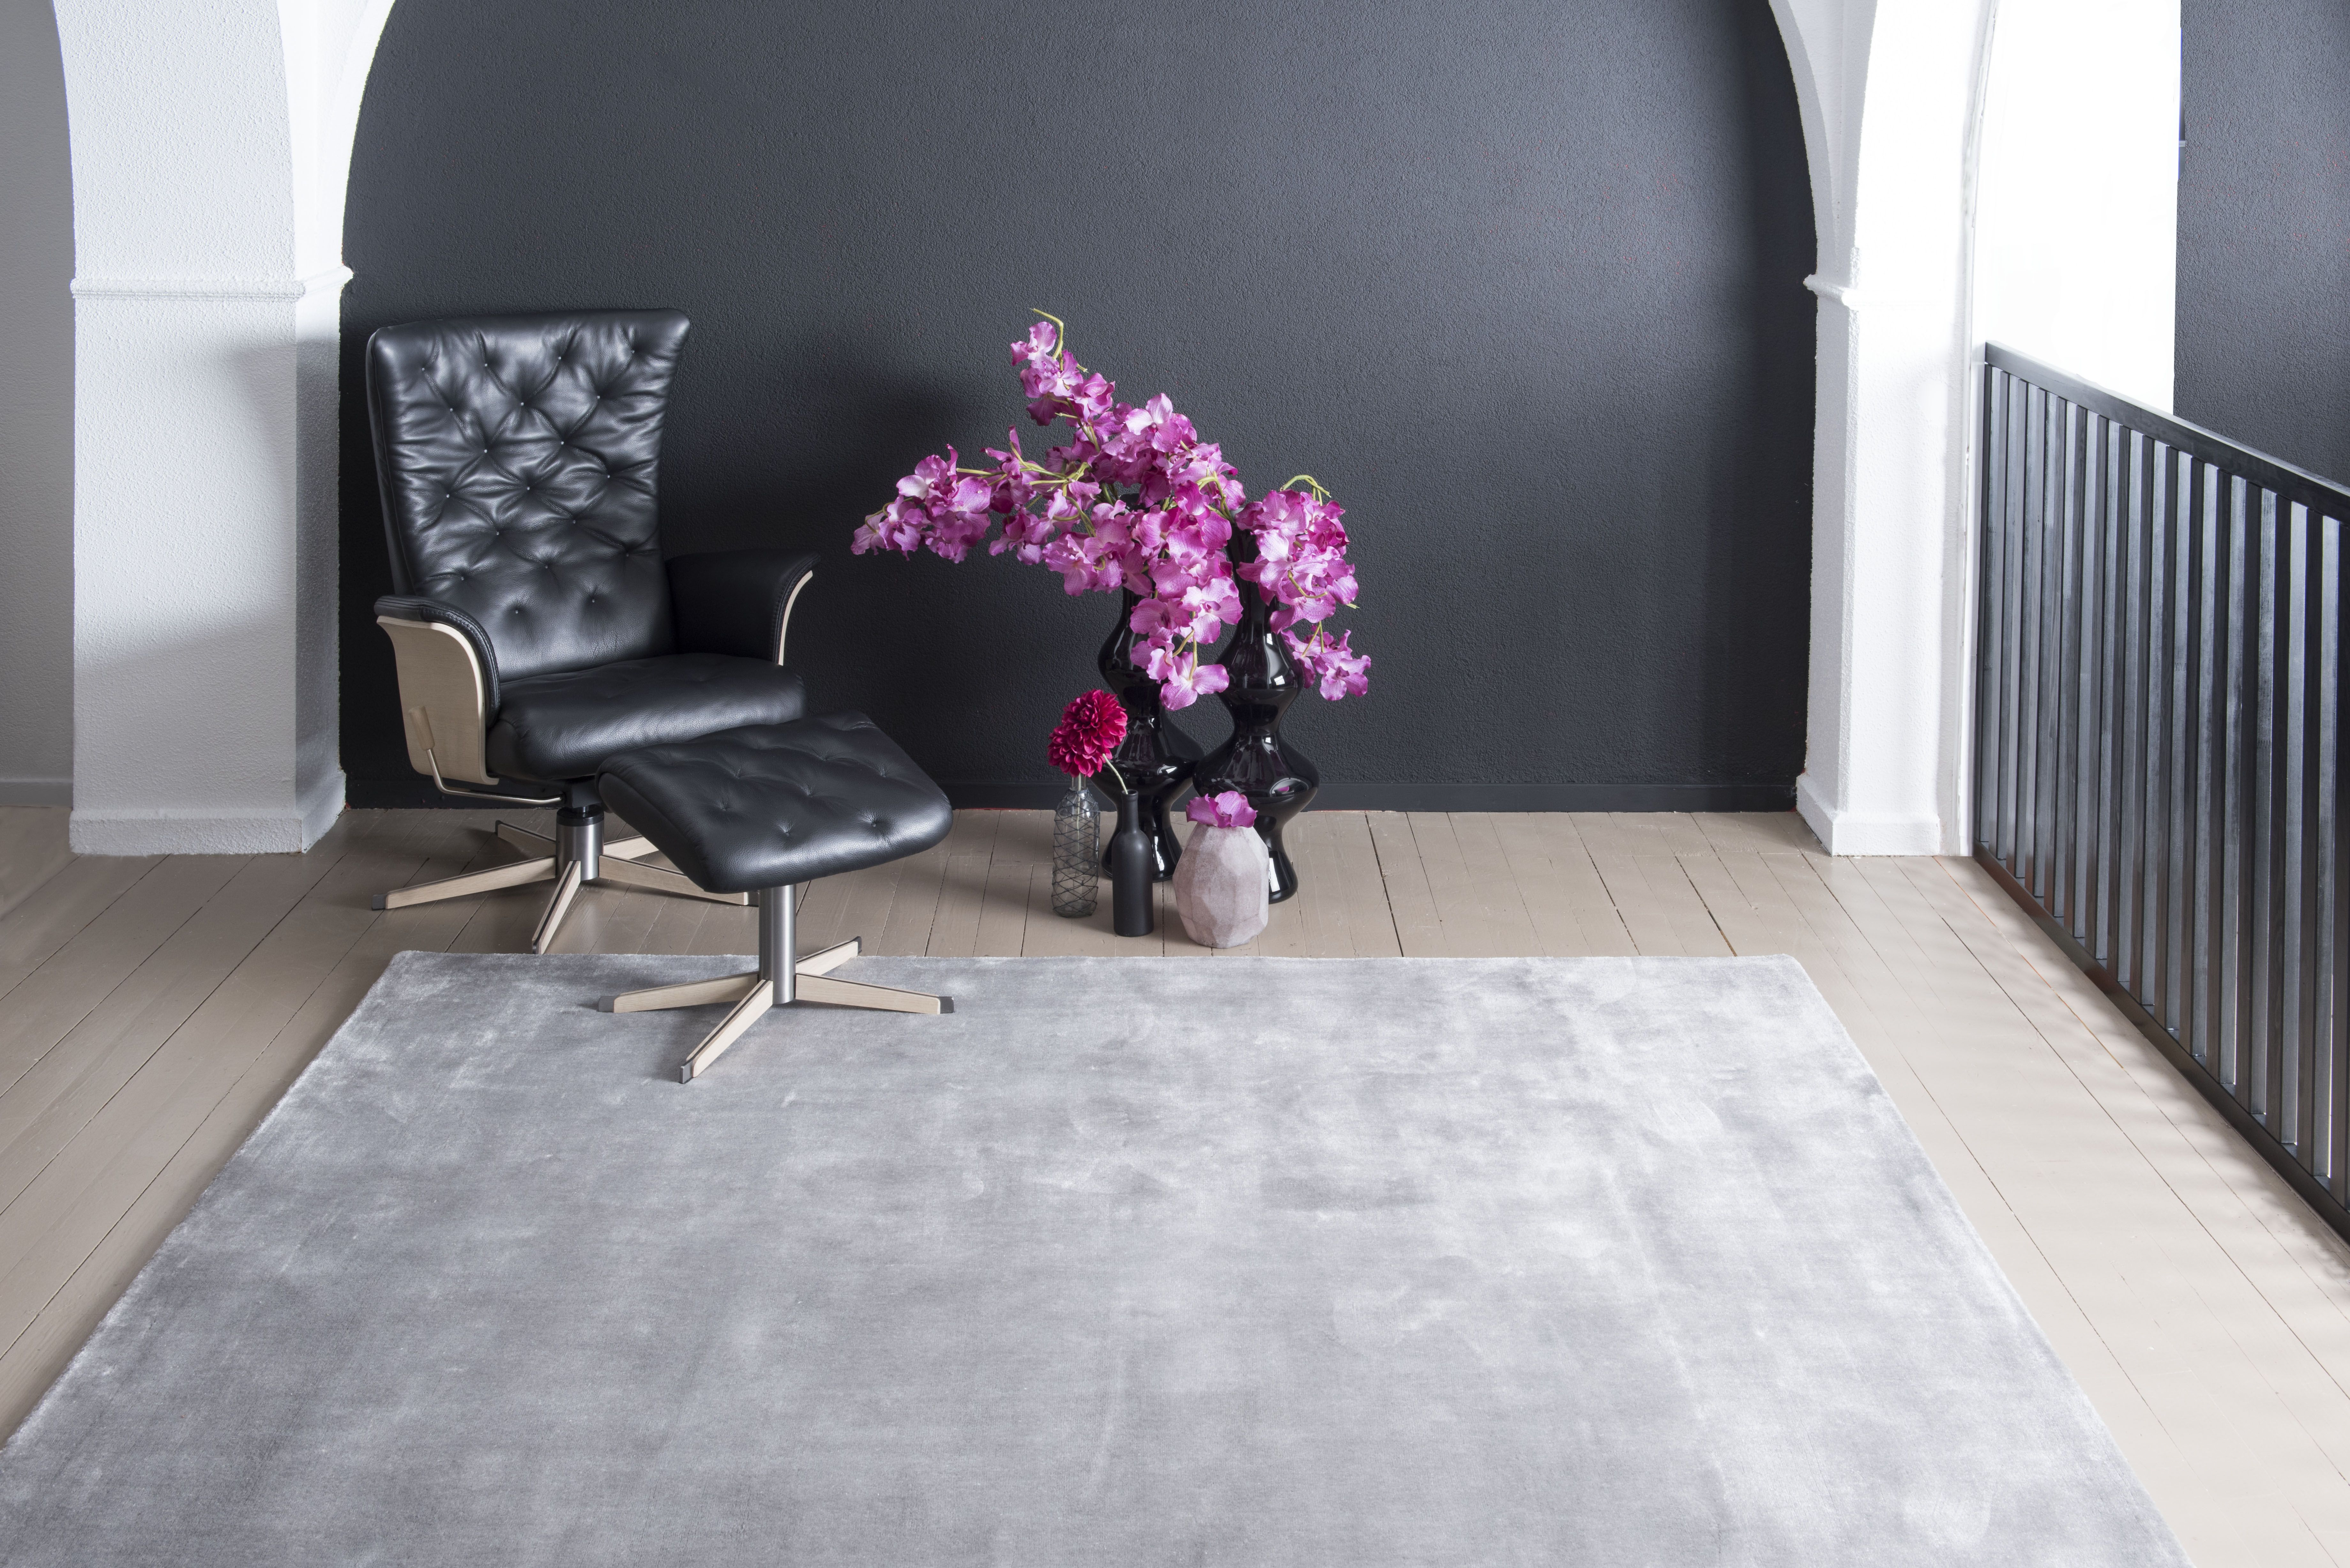 Brinker Carpets Flayosc Carpet Made Of 100 Tencel And Hand Woven In India Vloerkleed Eettafel Woonkamer